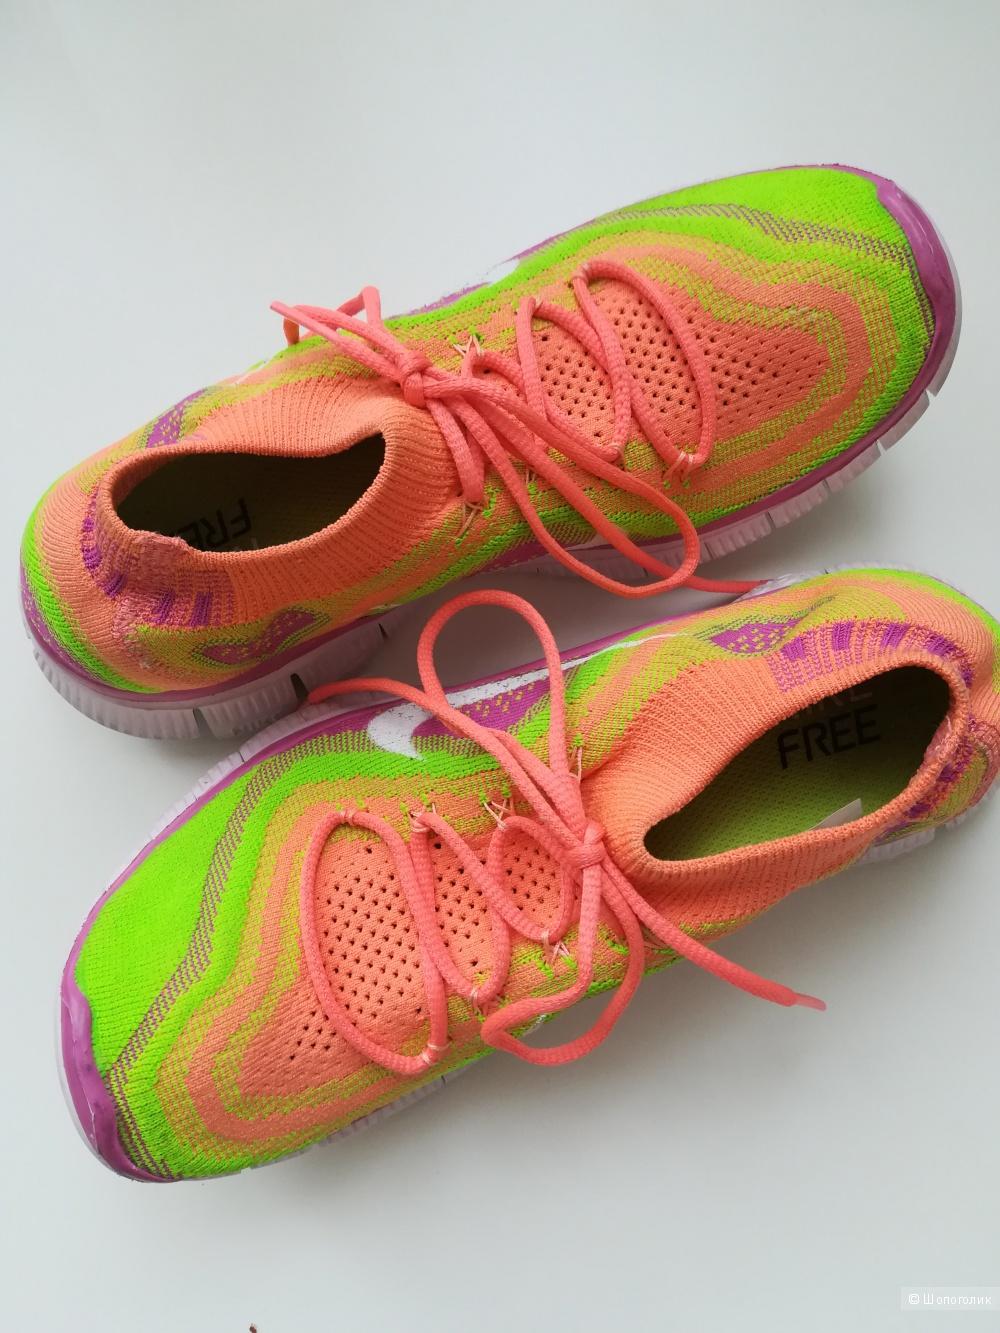 Кроссовки Nike free,размер 39 евр